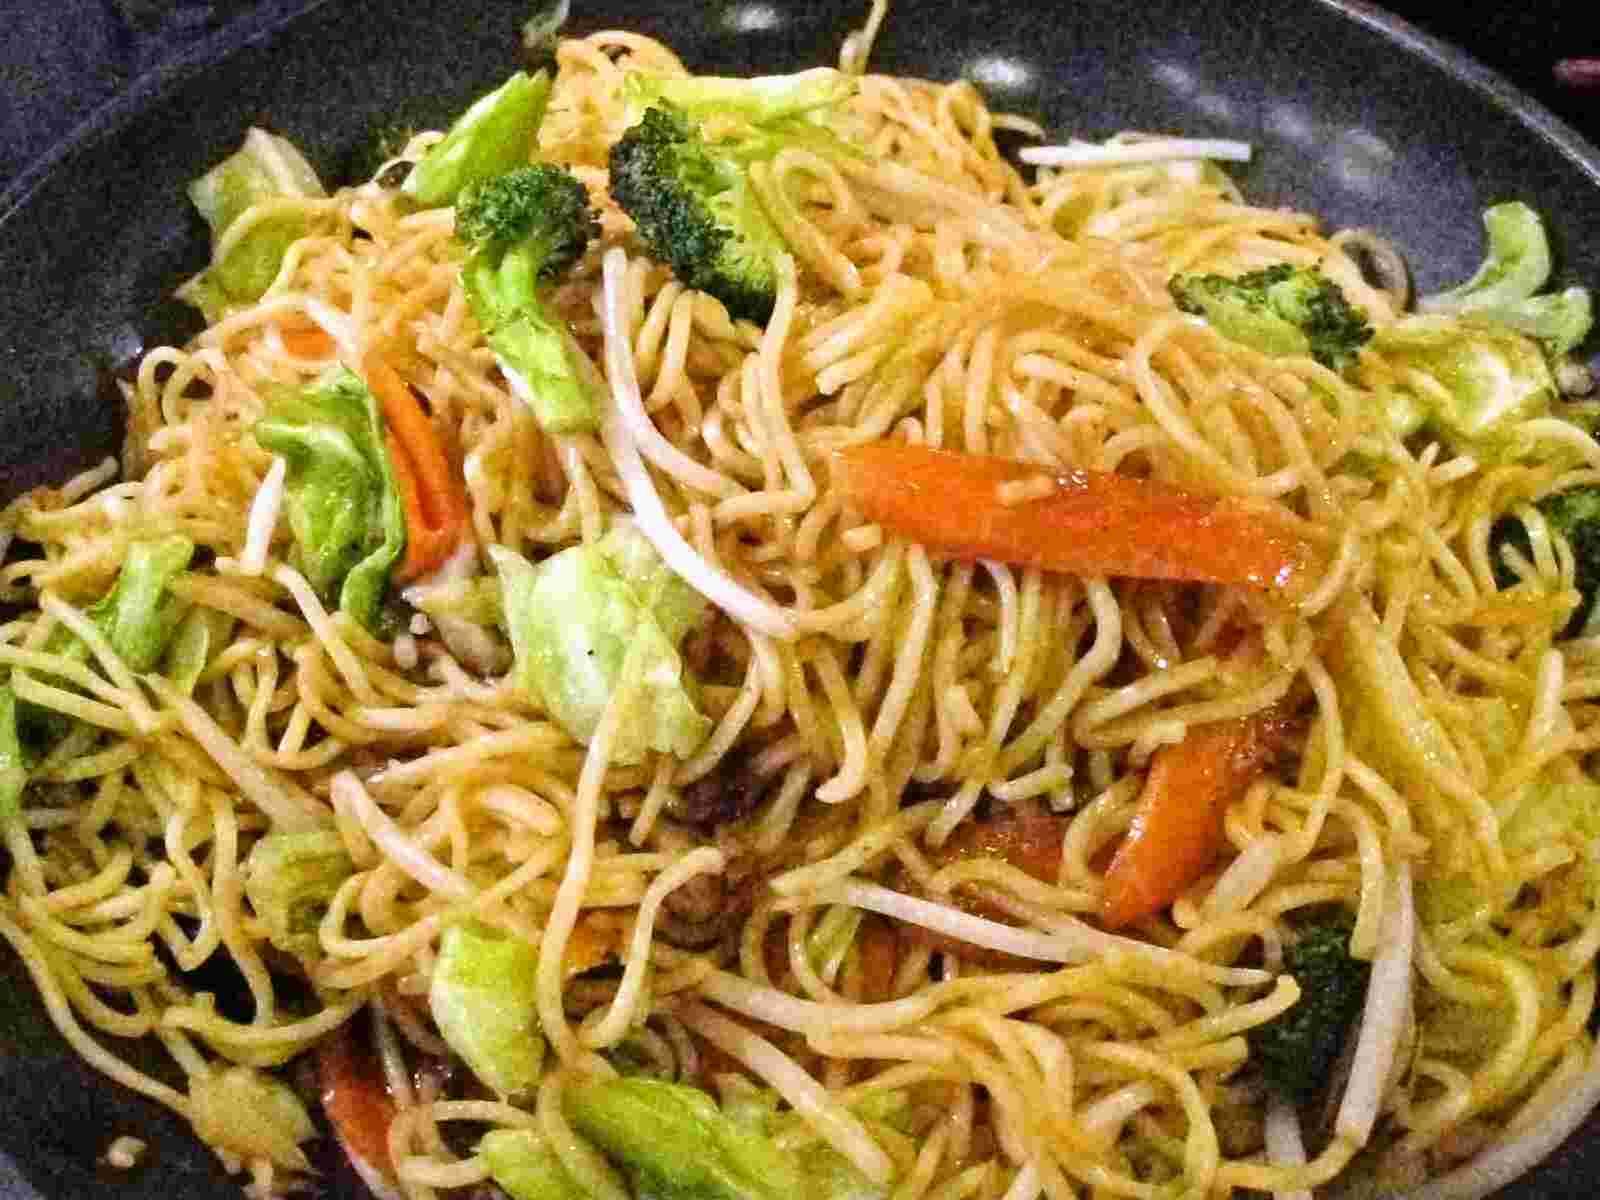 Yasai yakisoba, shoyu-aji / fried noodles with vegetables, soy sauce ...